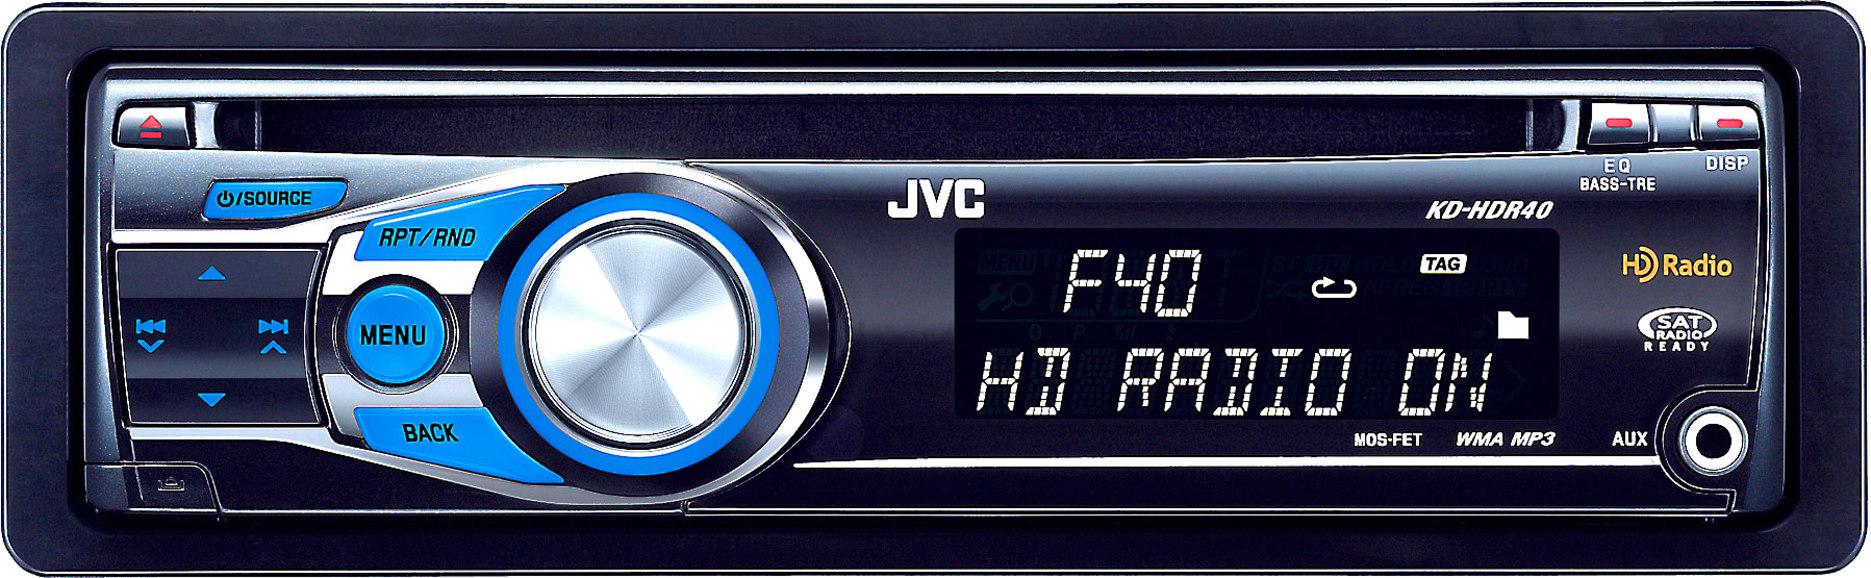 JVC KD-HDR40 CD receiver at Crutchfield on